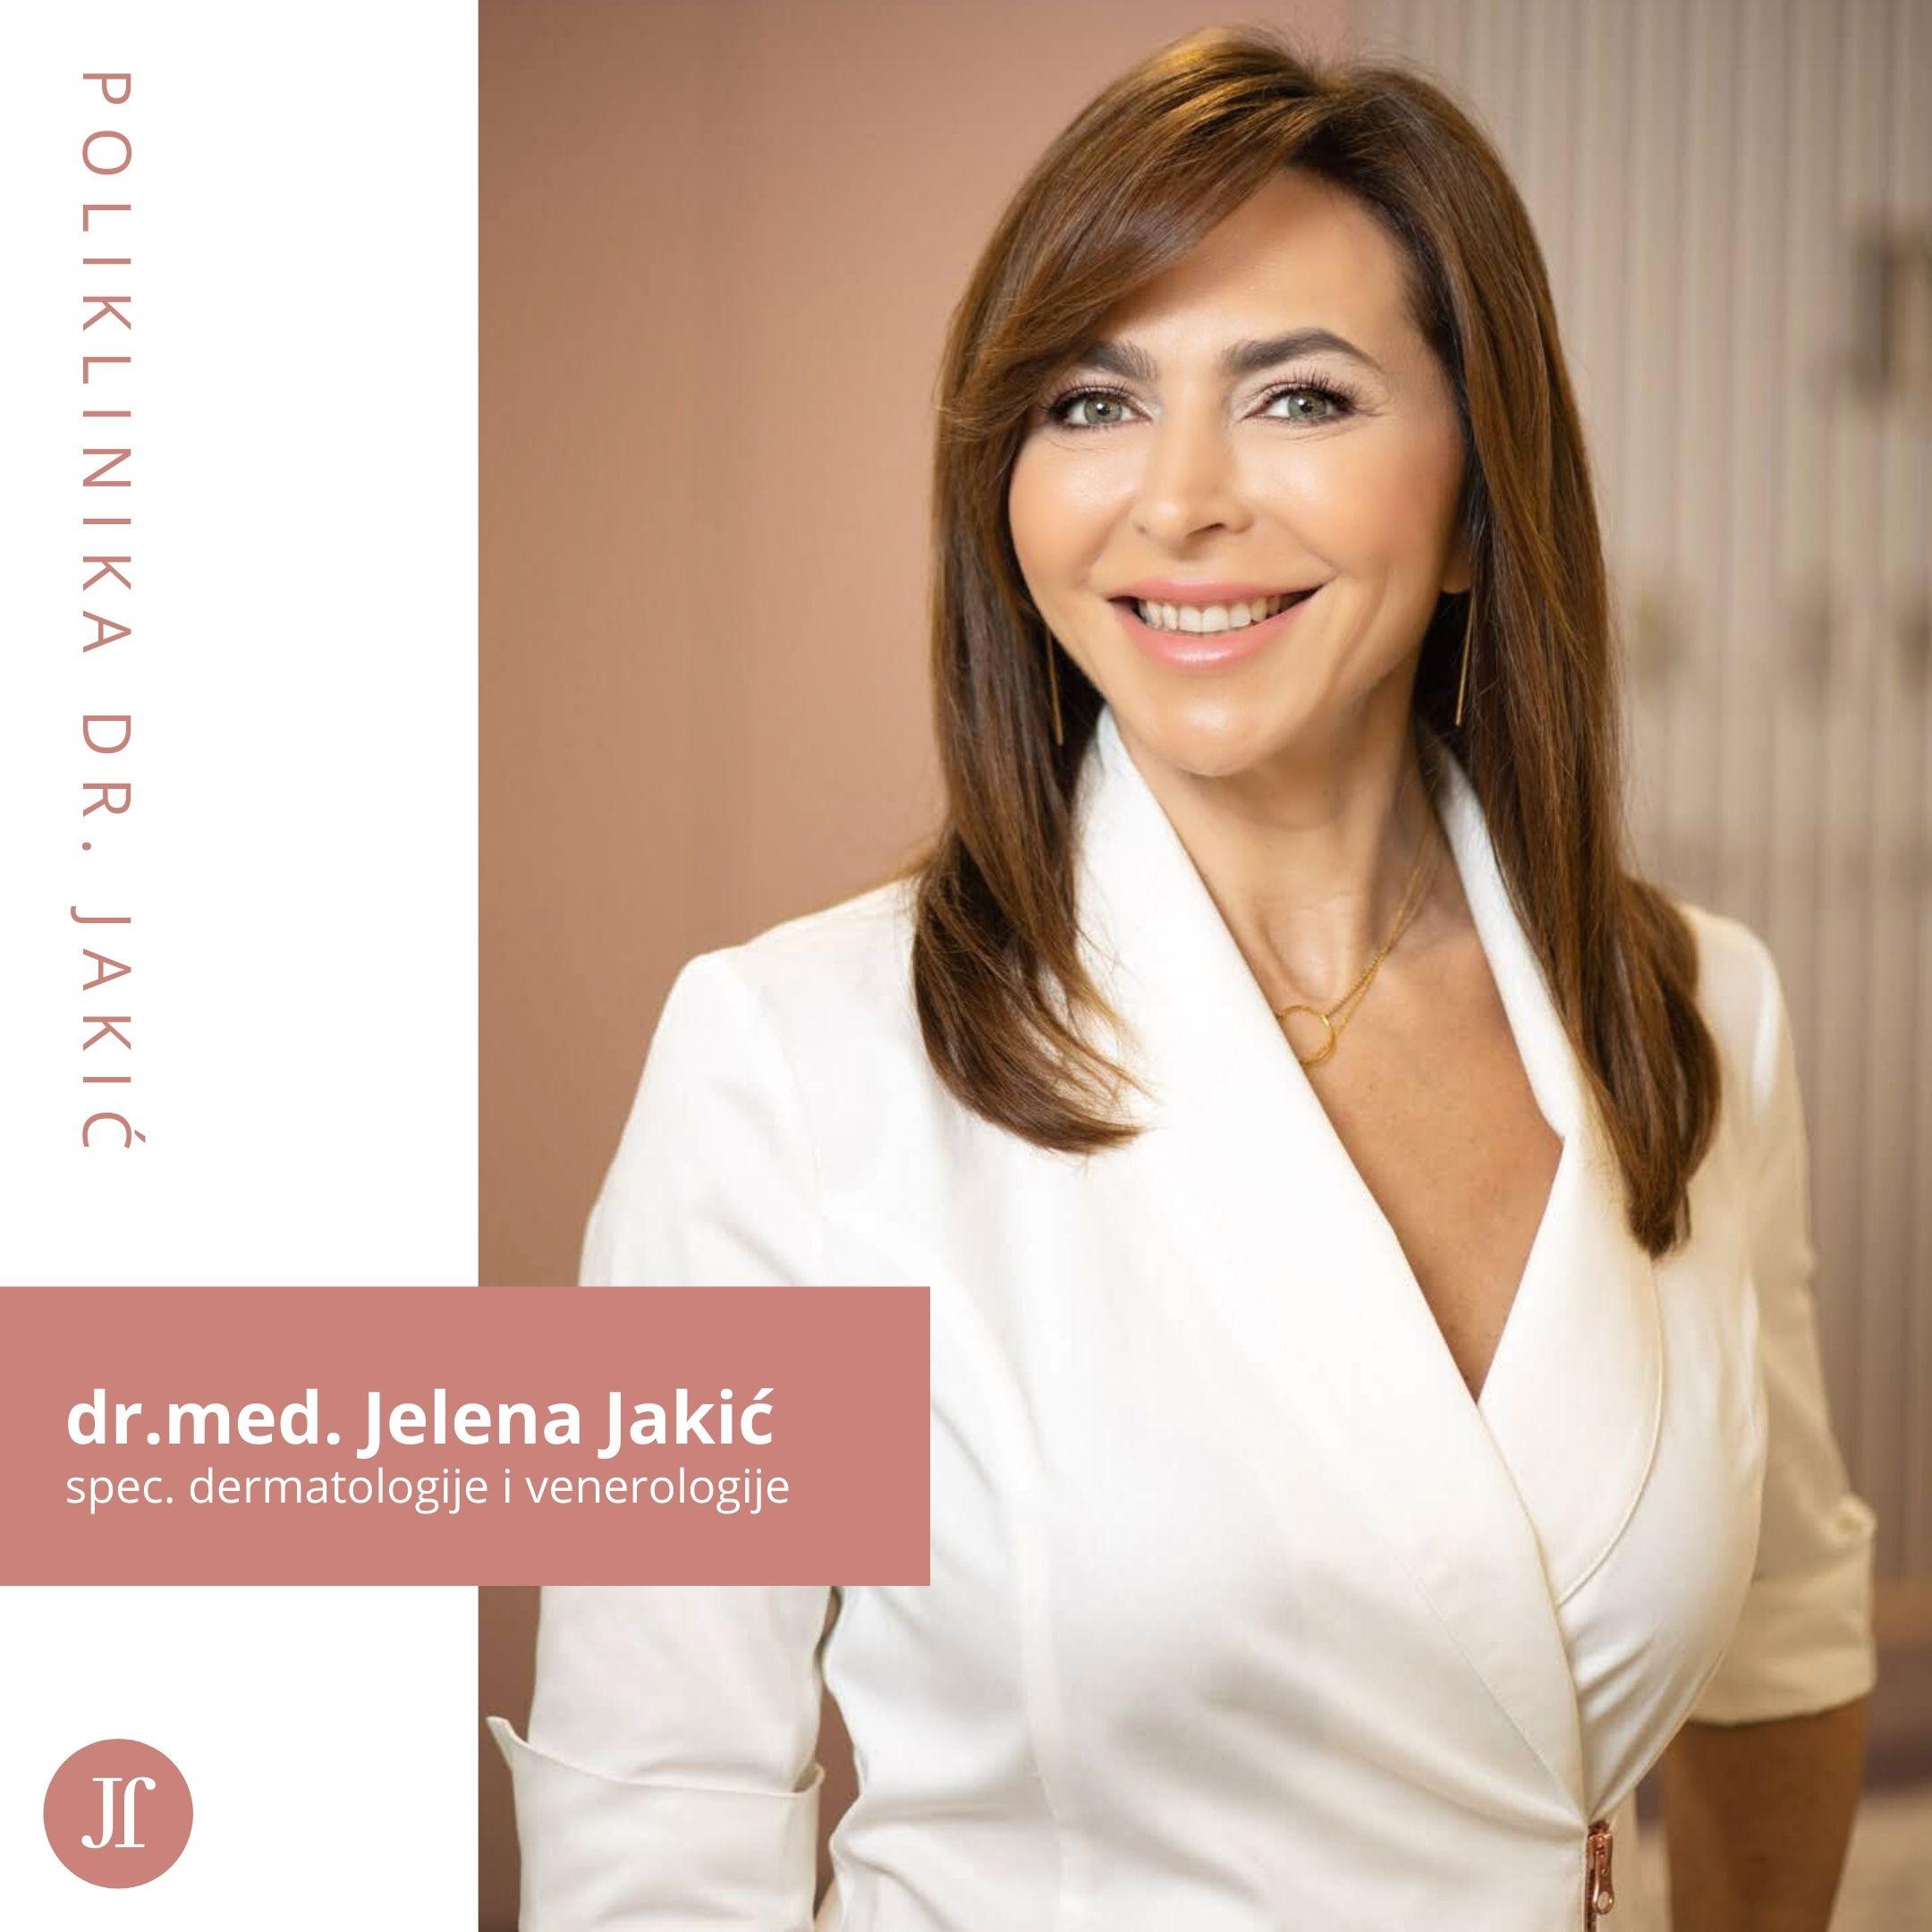 Jelena Jakić, dr.med